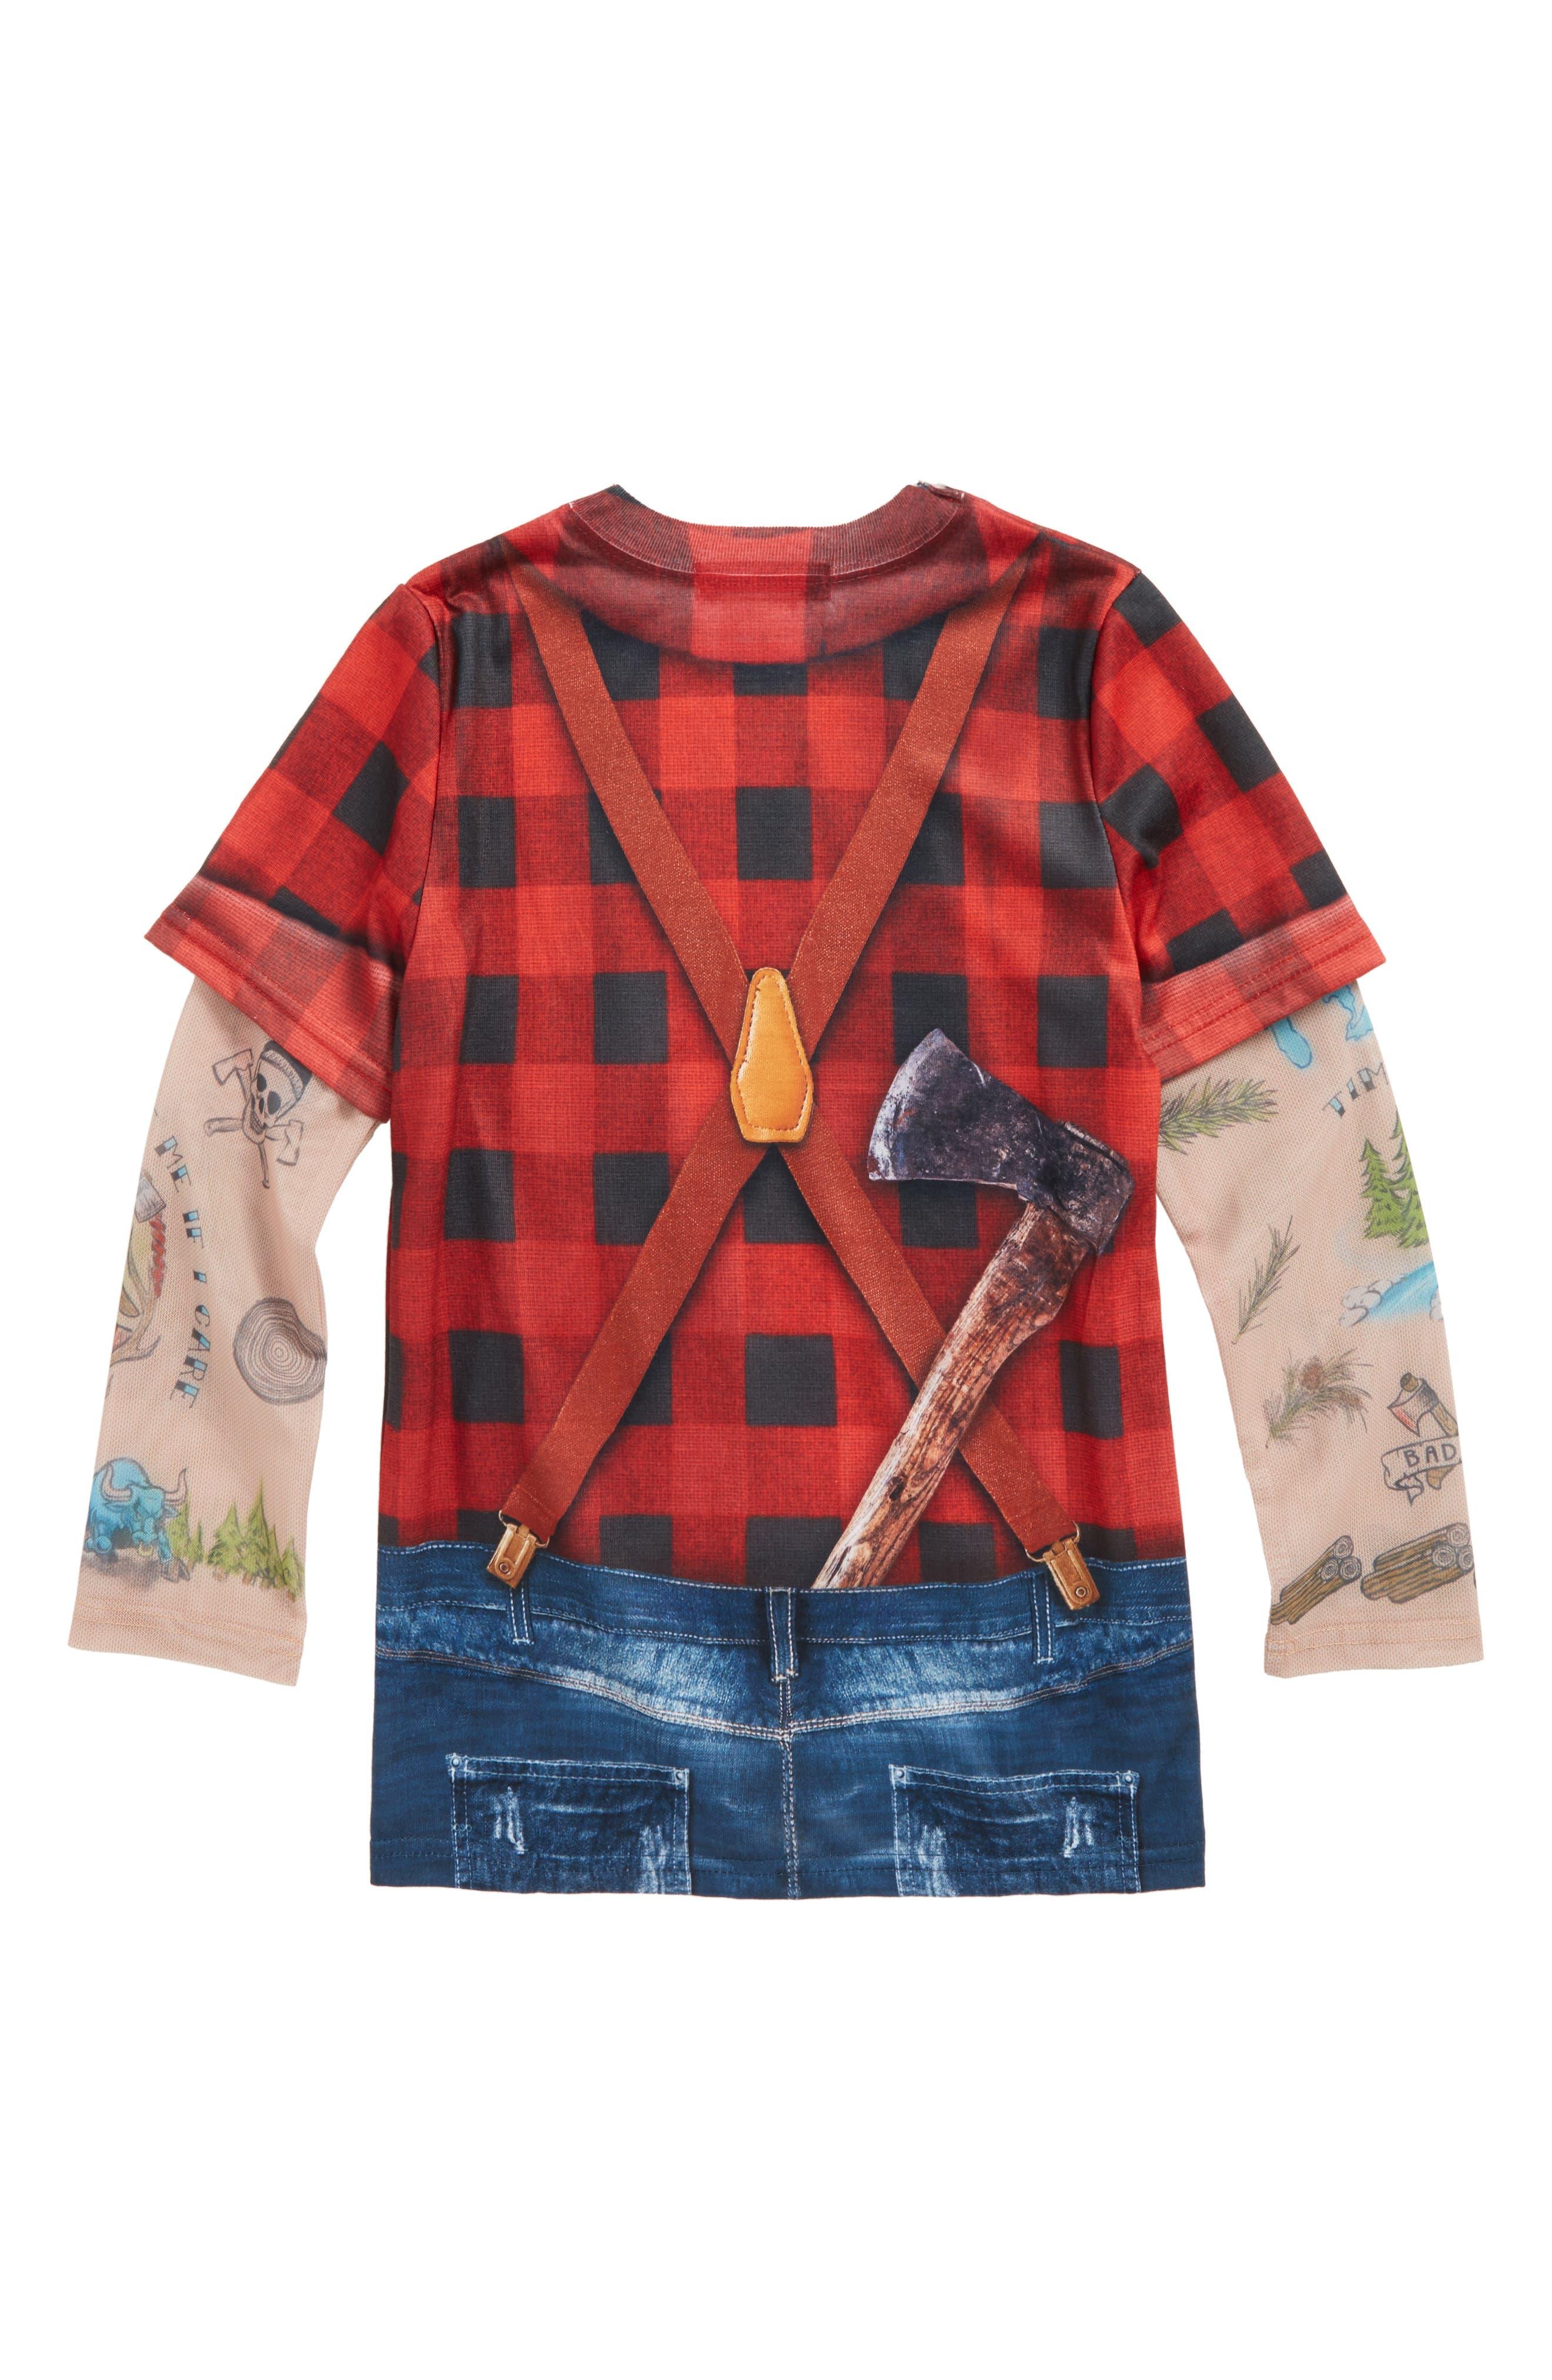 Lumberjack Tattoo Print Sleeve T-Shirt,                             Alternate thumbnail 2, color,                             Red/ Black Plaid